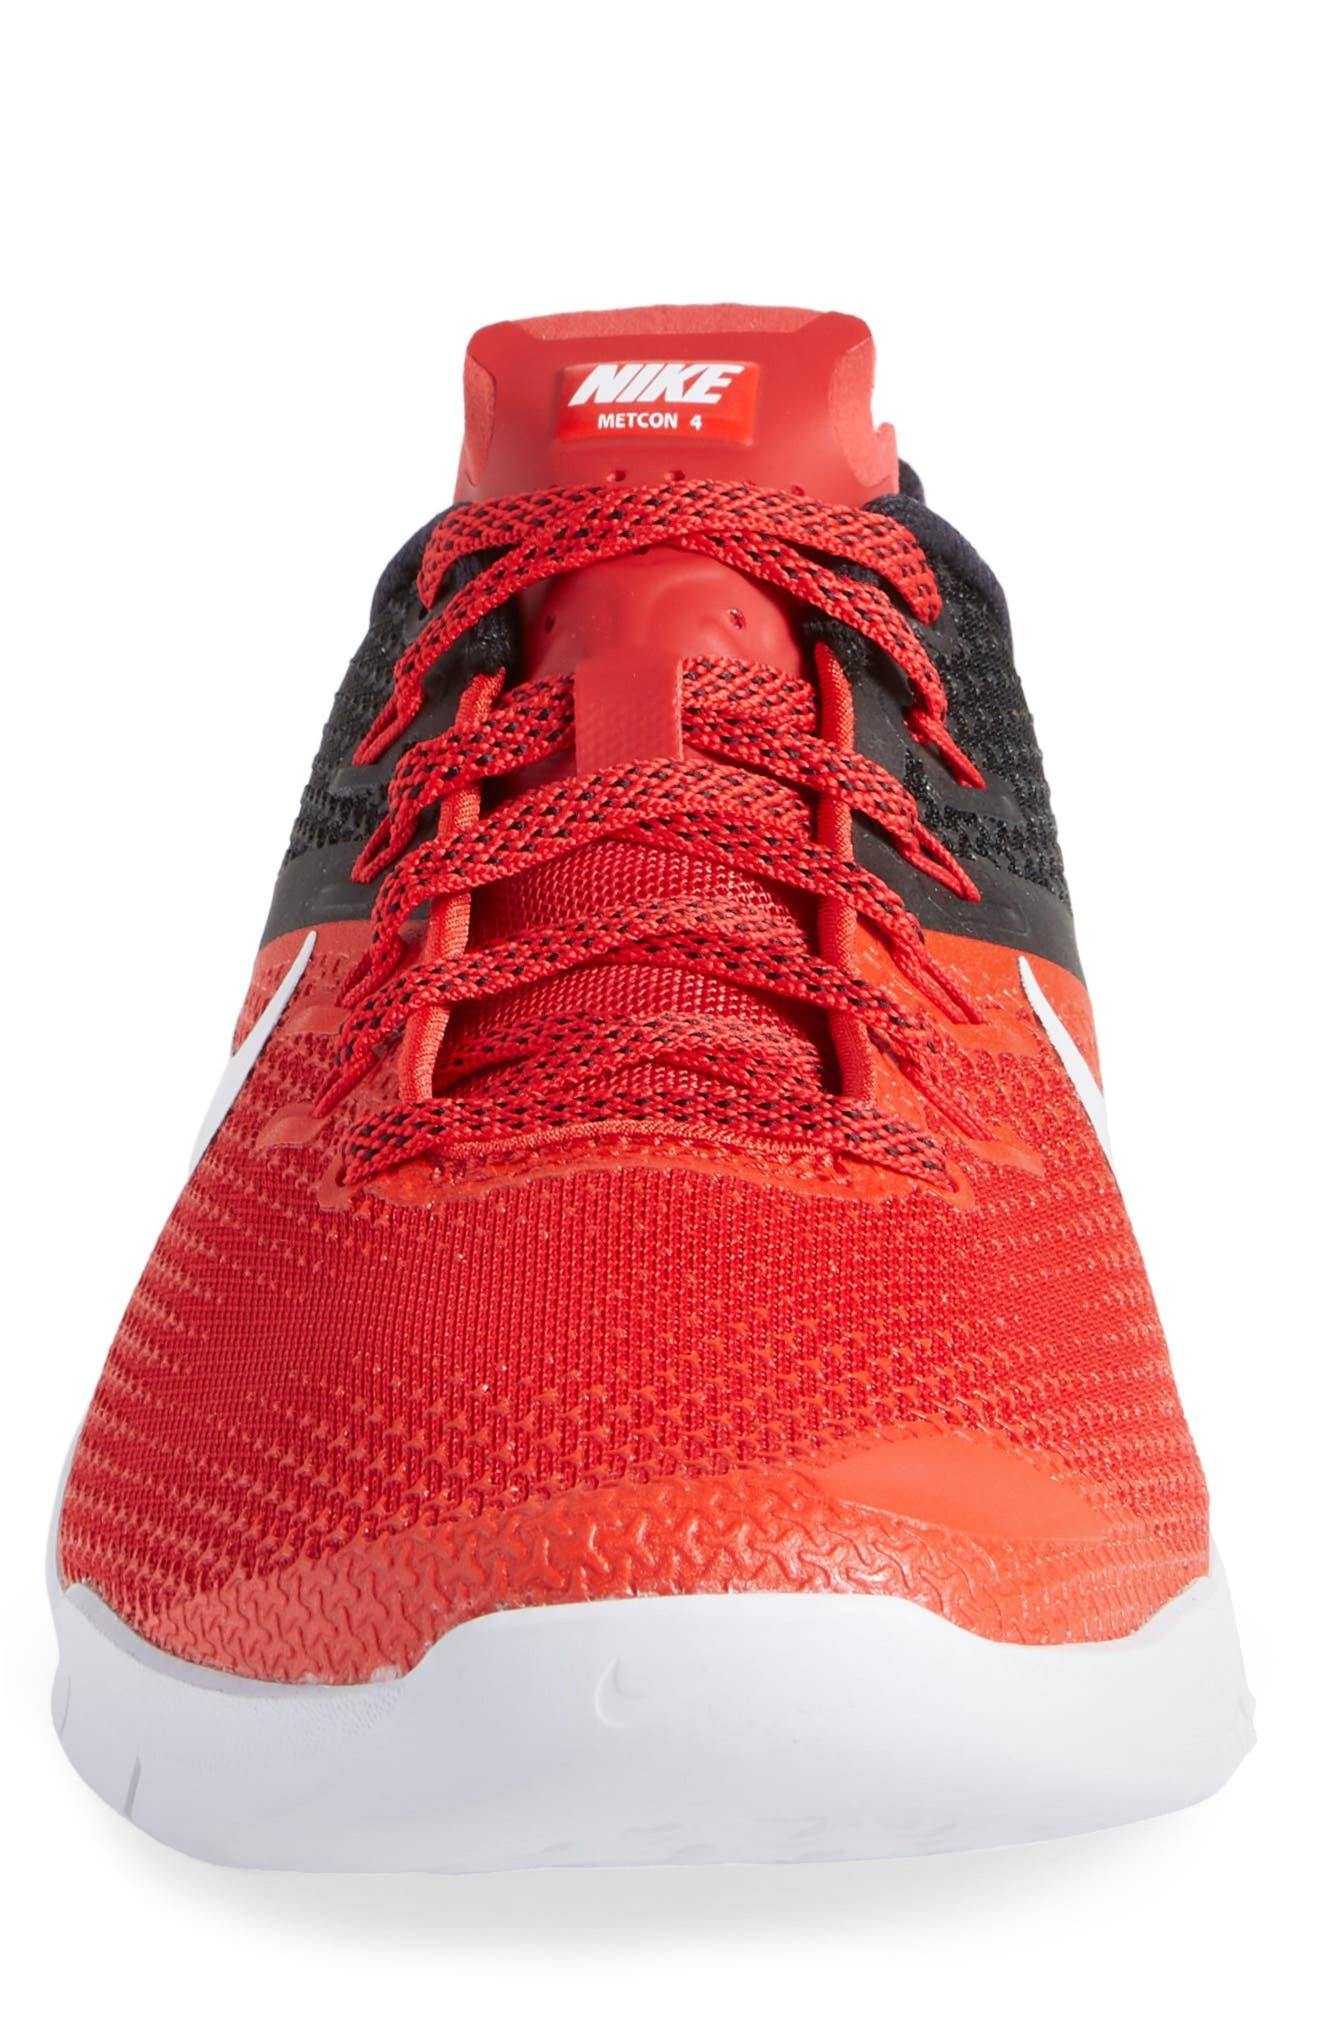 Metcon 4 Training Shoe,                             Alternate thumbnail 63, color,